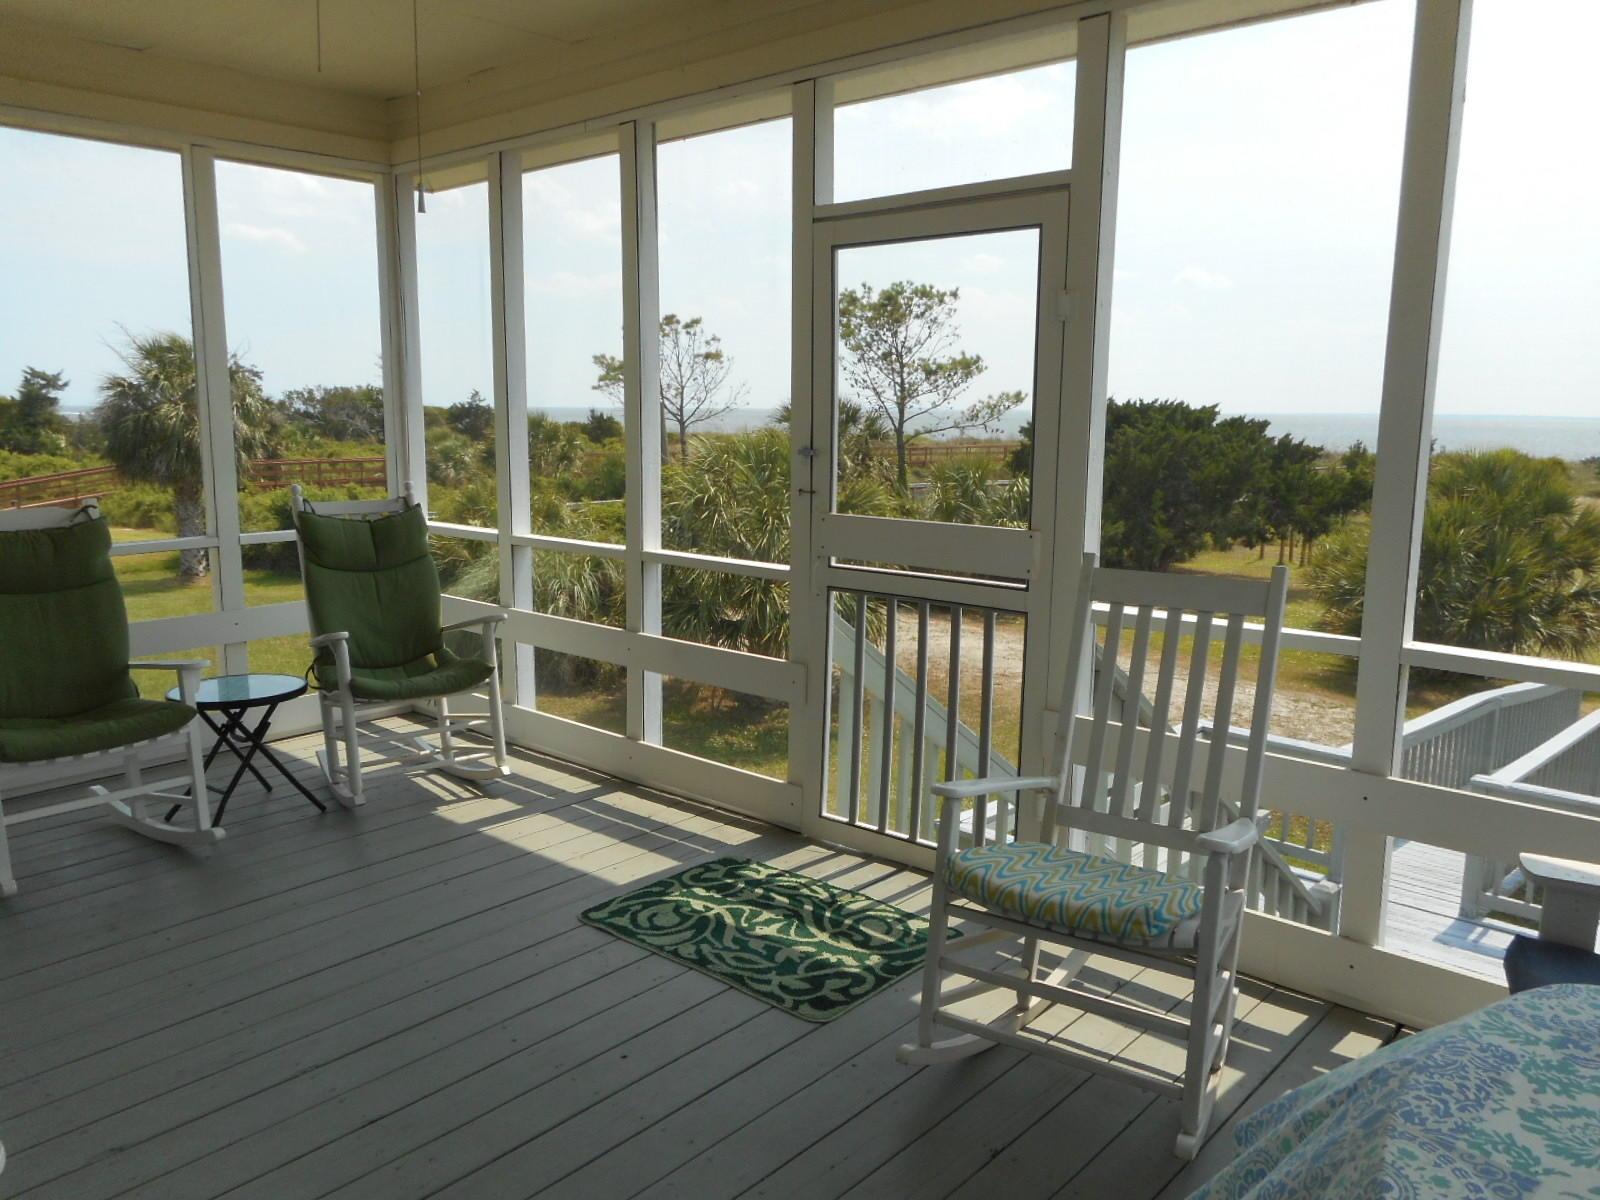 Beachfront Homes For Sale - 3608 Yacht Club, Edisto Beach, SC - 28